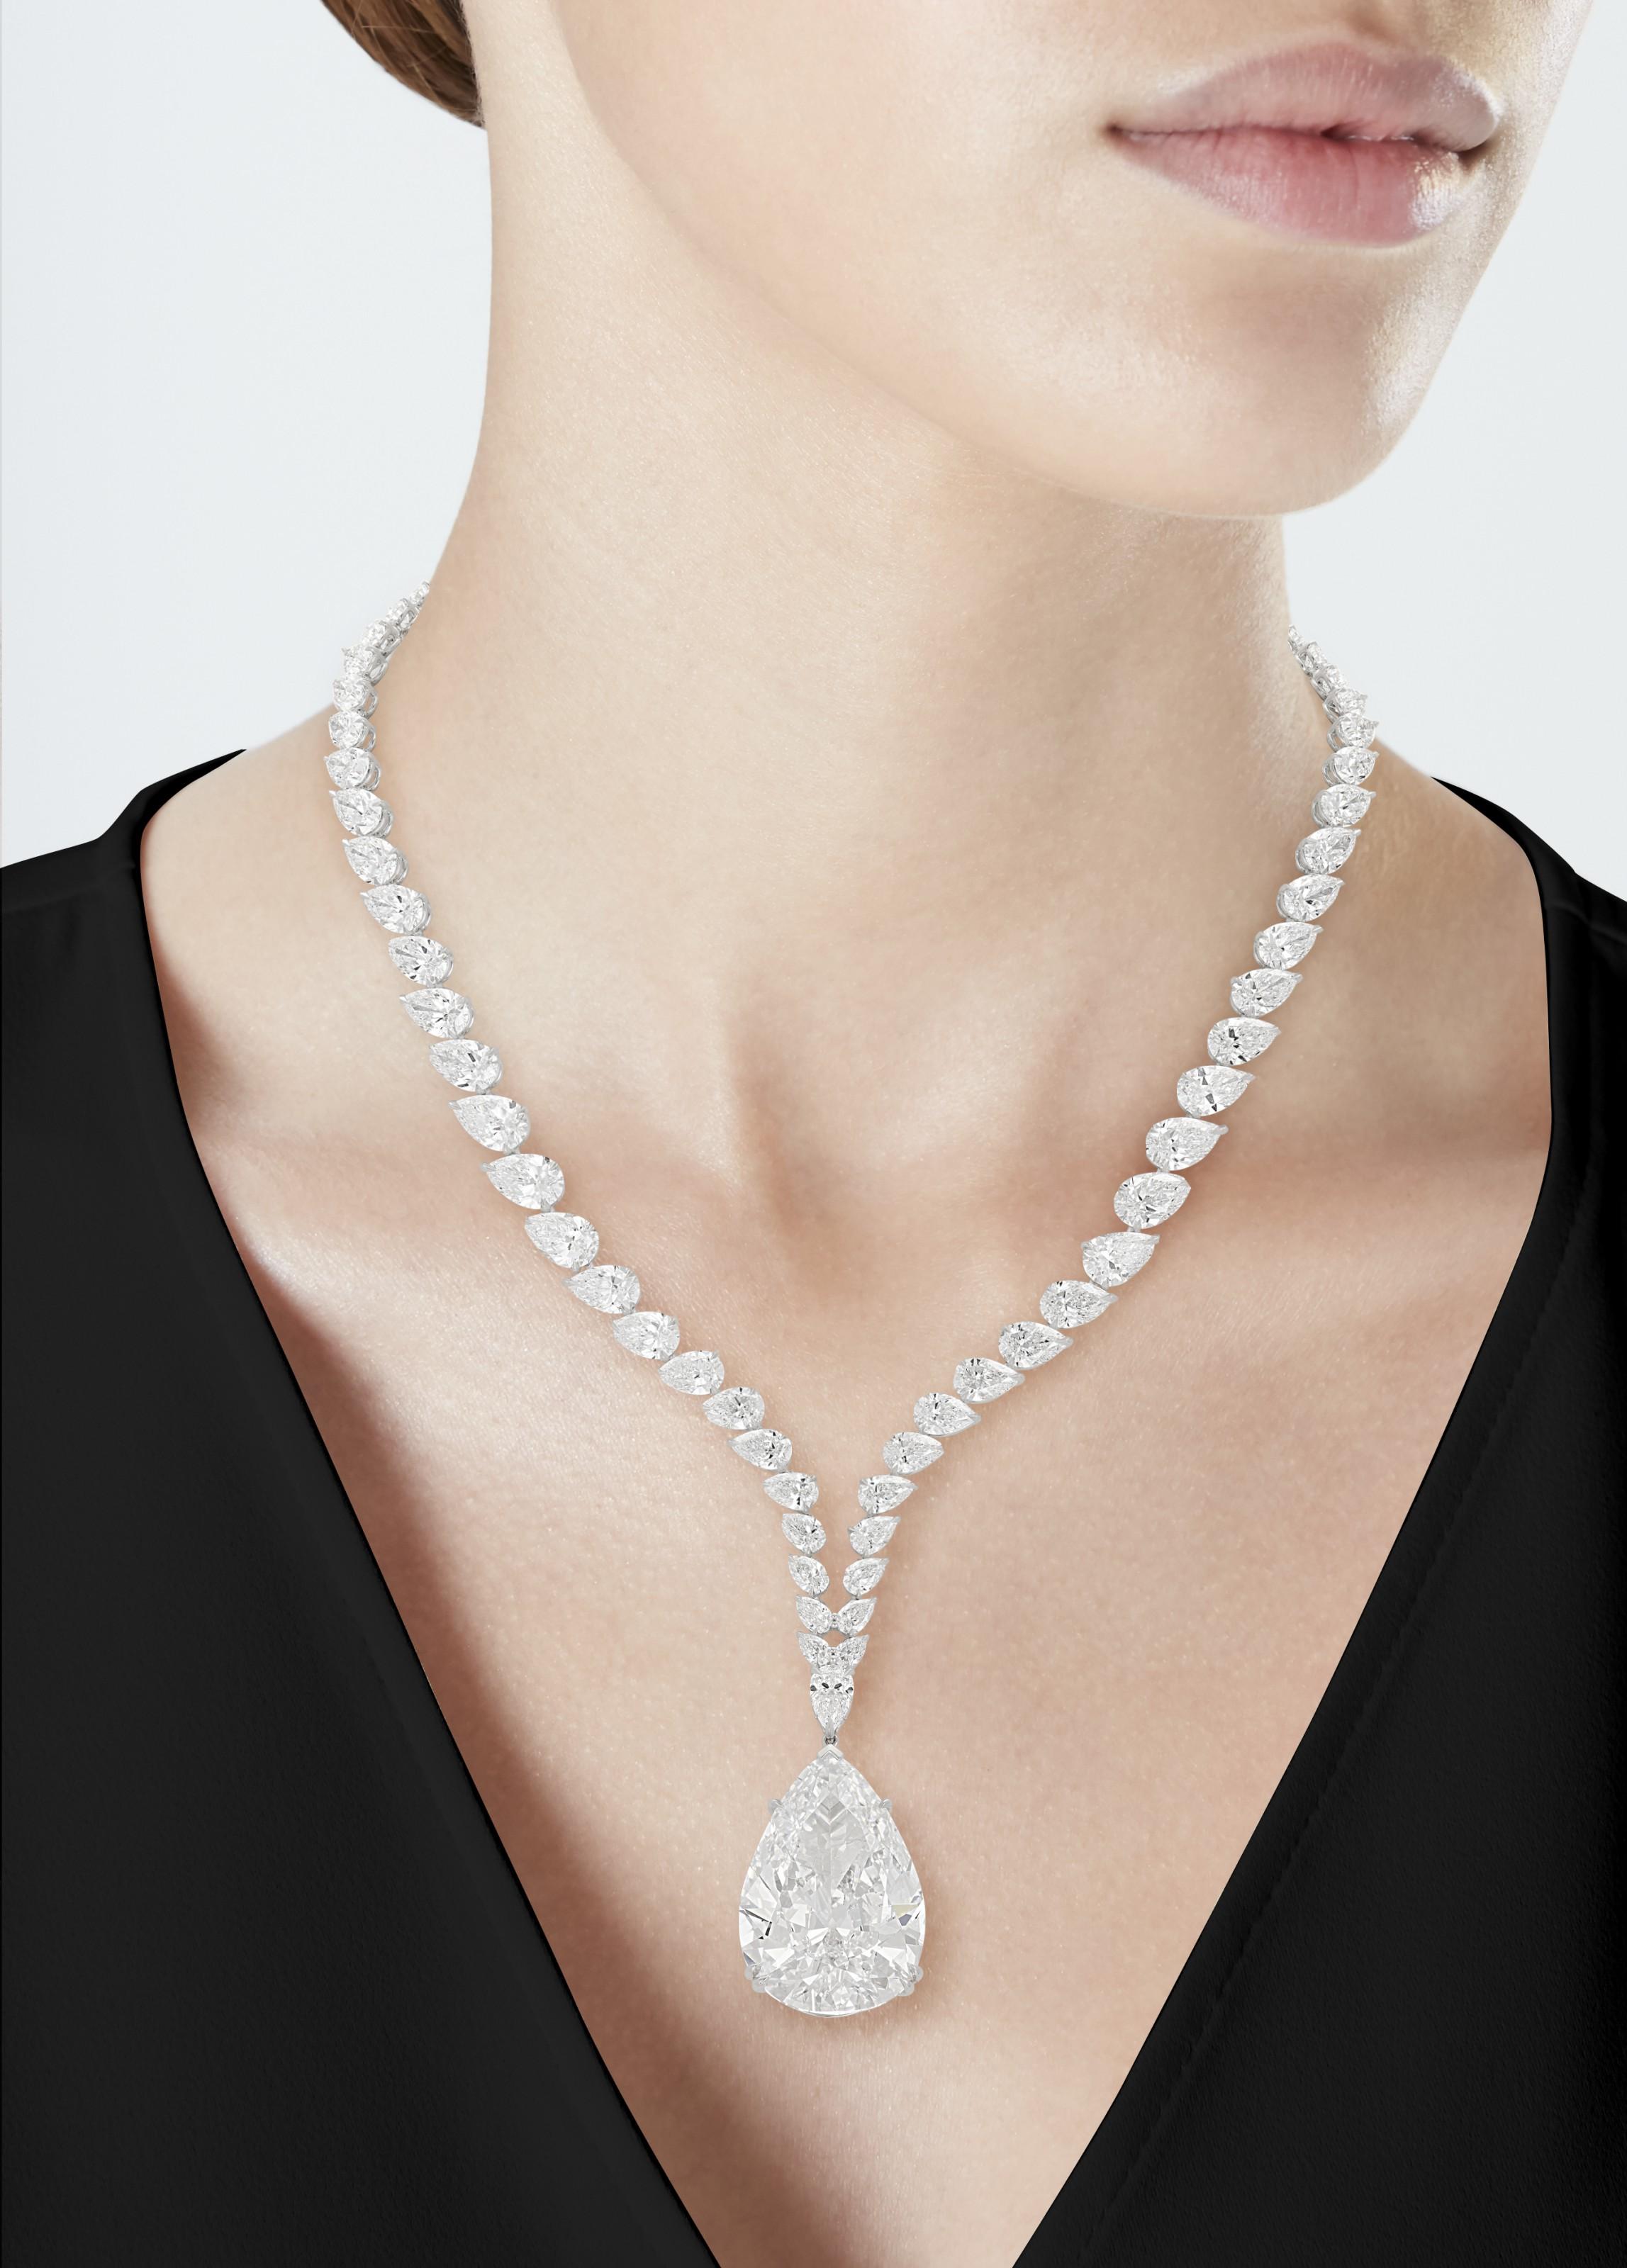 THE CHRYSLER DIAMOND A MAGNIFICENT DIAMOND PENDANT NECKLACE